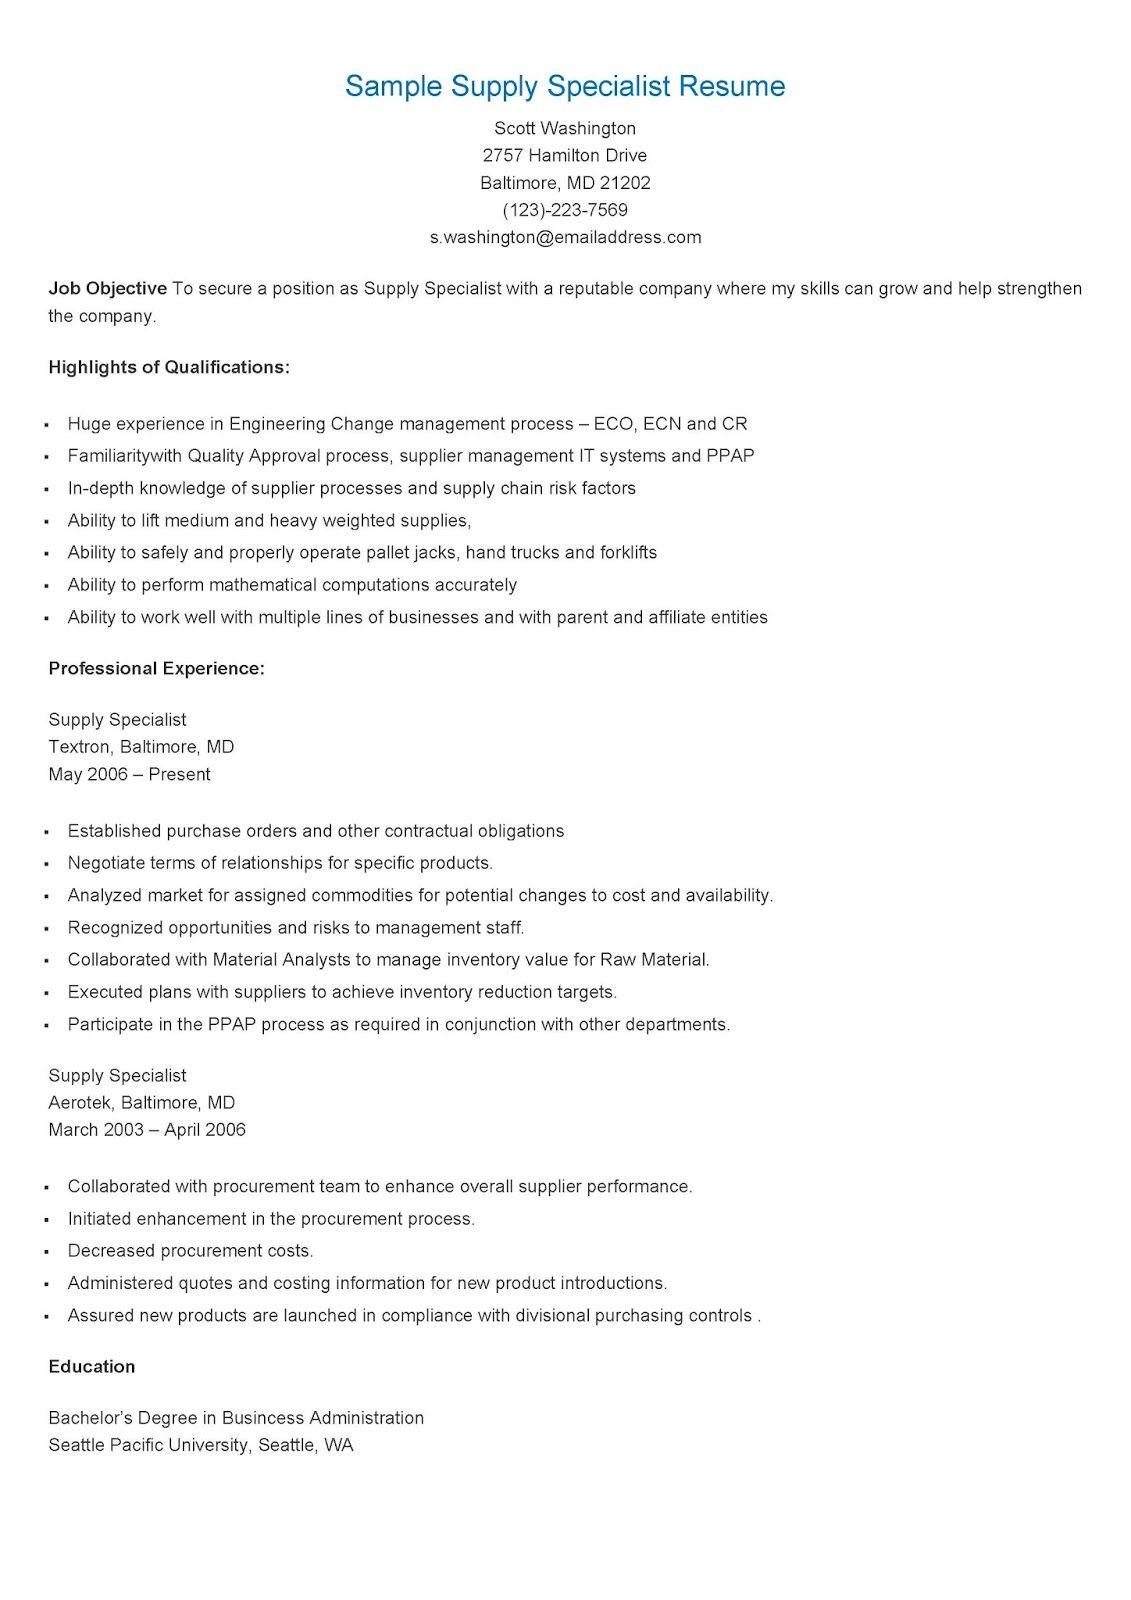 Sample Supply Specialist Resume Resume, Sample resume